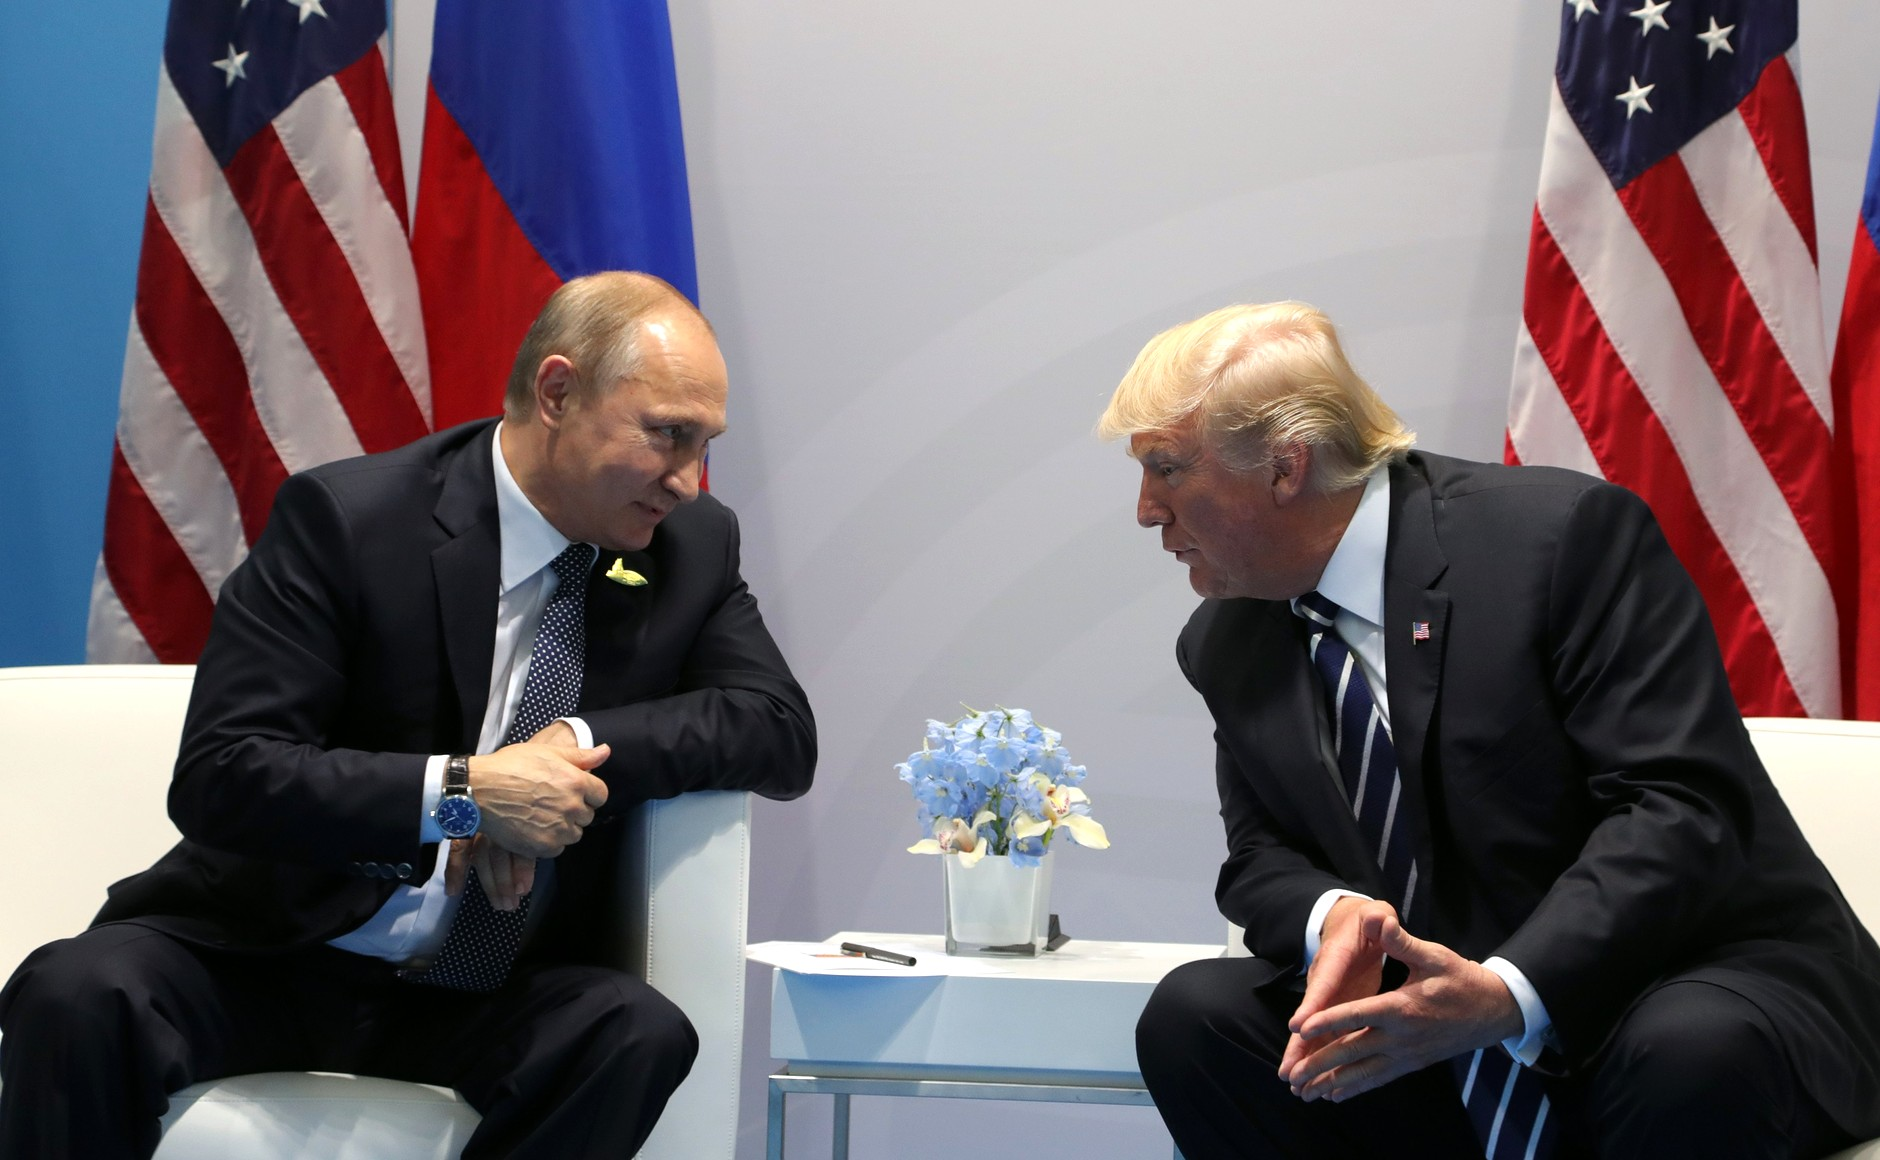 Vladimir_Putin_and_Donald_Trump_at_the_2017_G-20_Hamburg_Summit_(3)